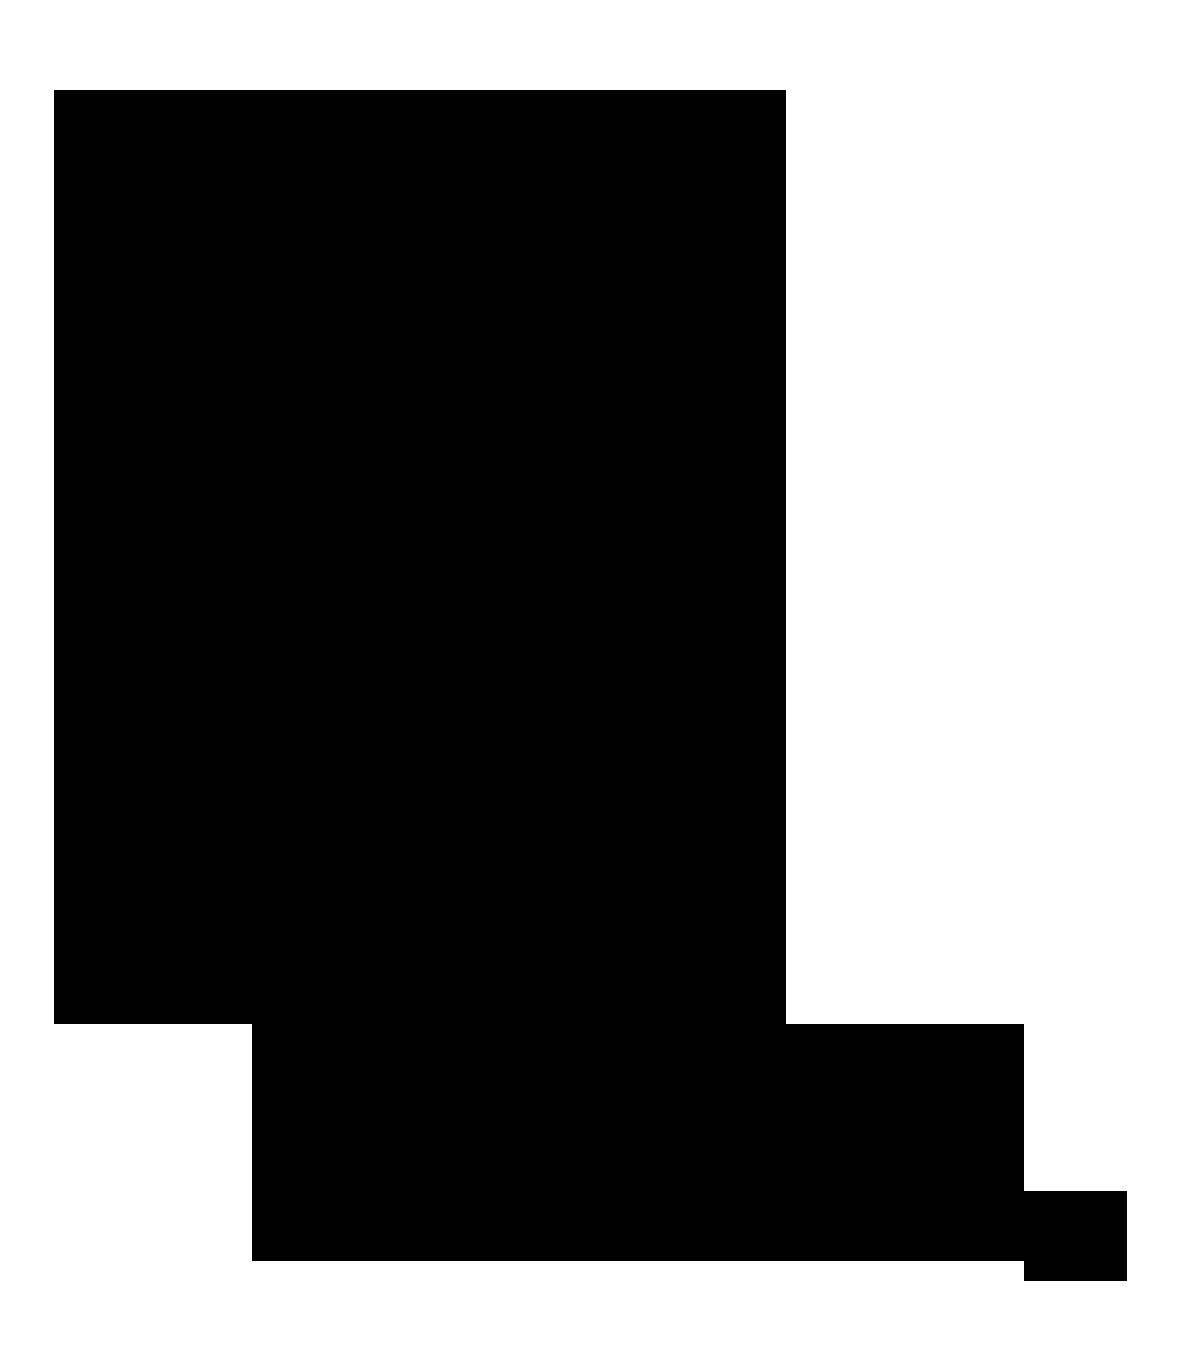 Sitting Black Cat Silhouette - ClipArt Best